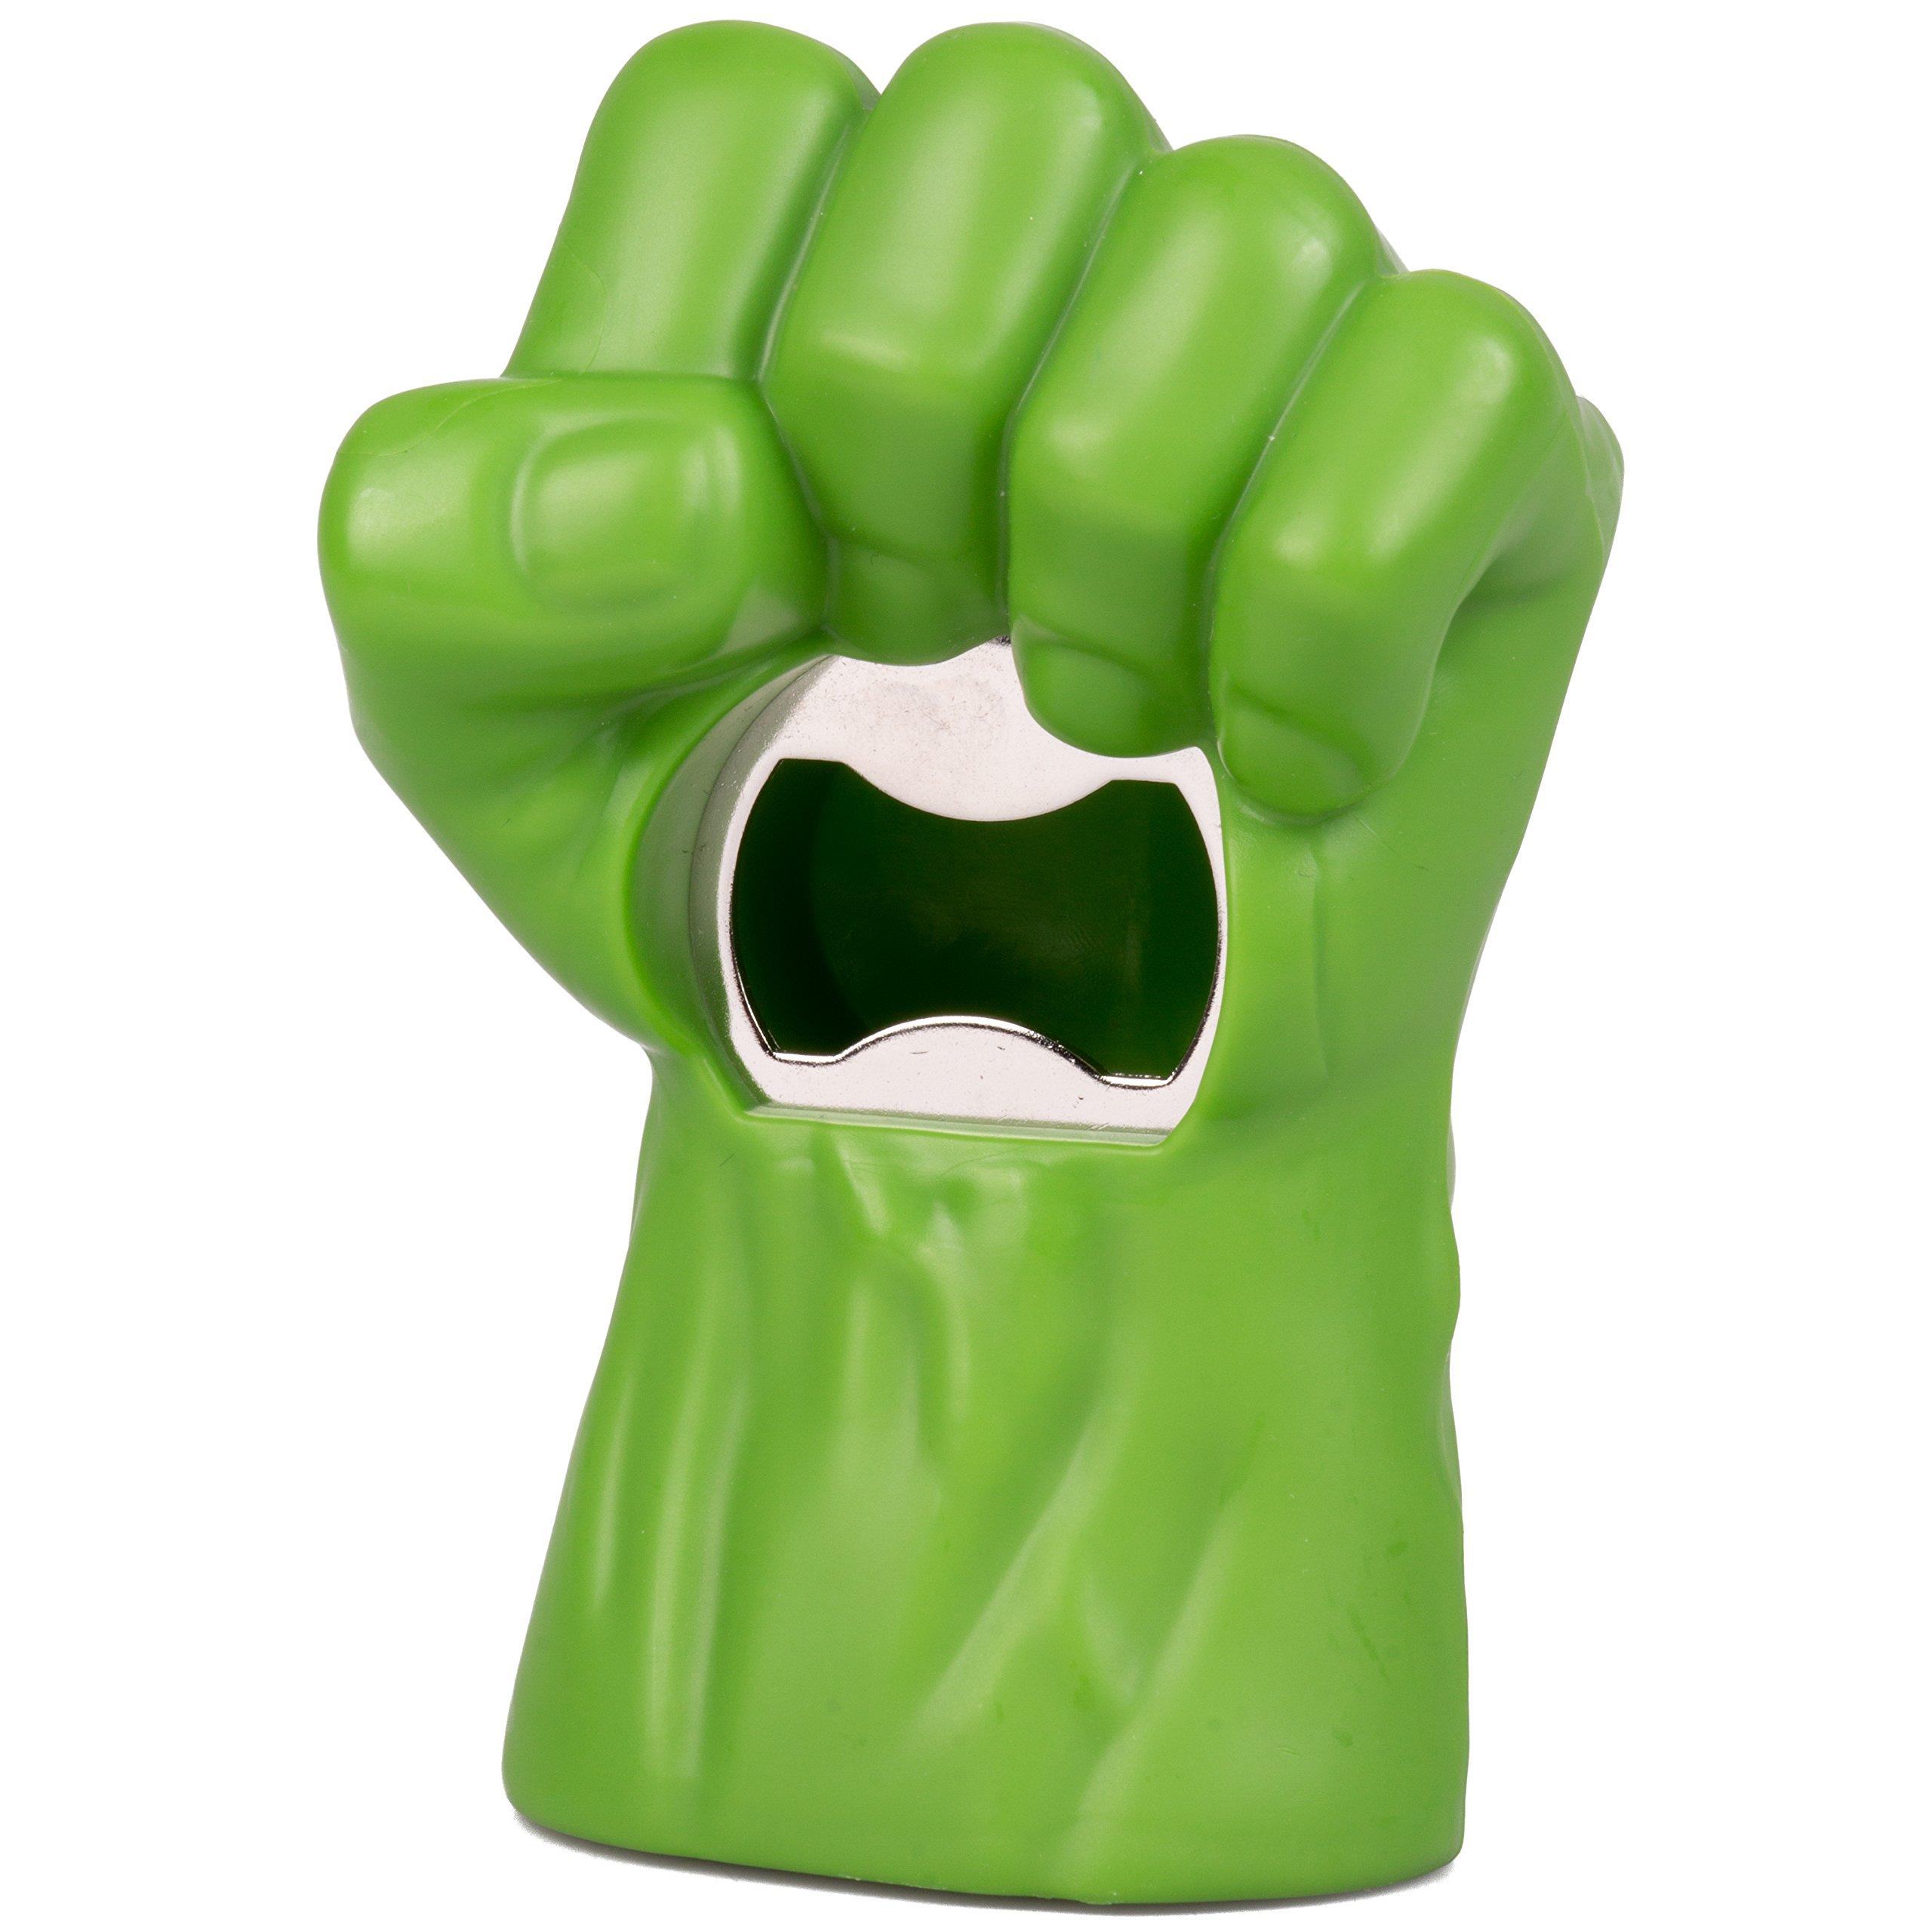 Marvel Hulk Fist Bottle Opener - Open Your Beverage Like a Super Hero